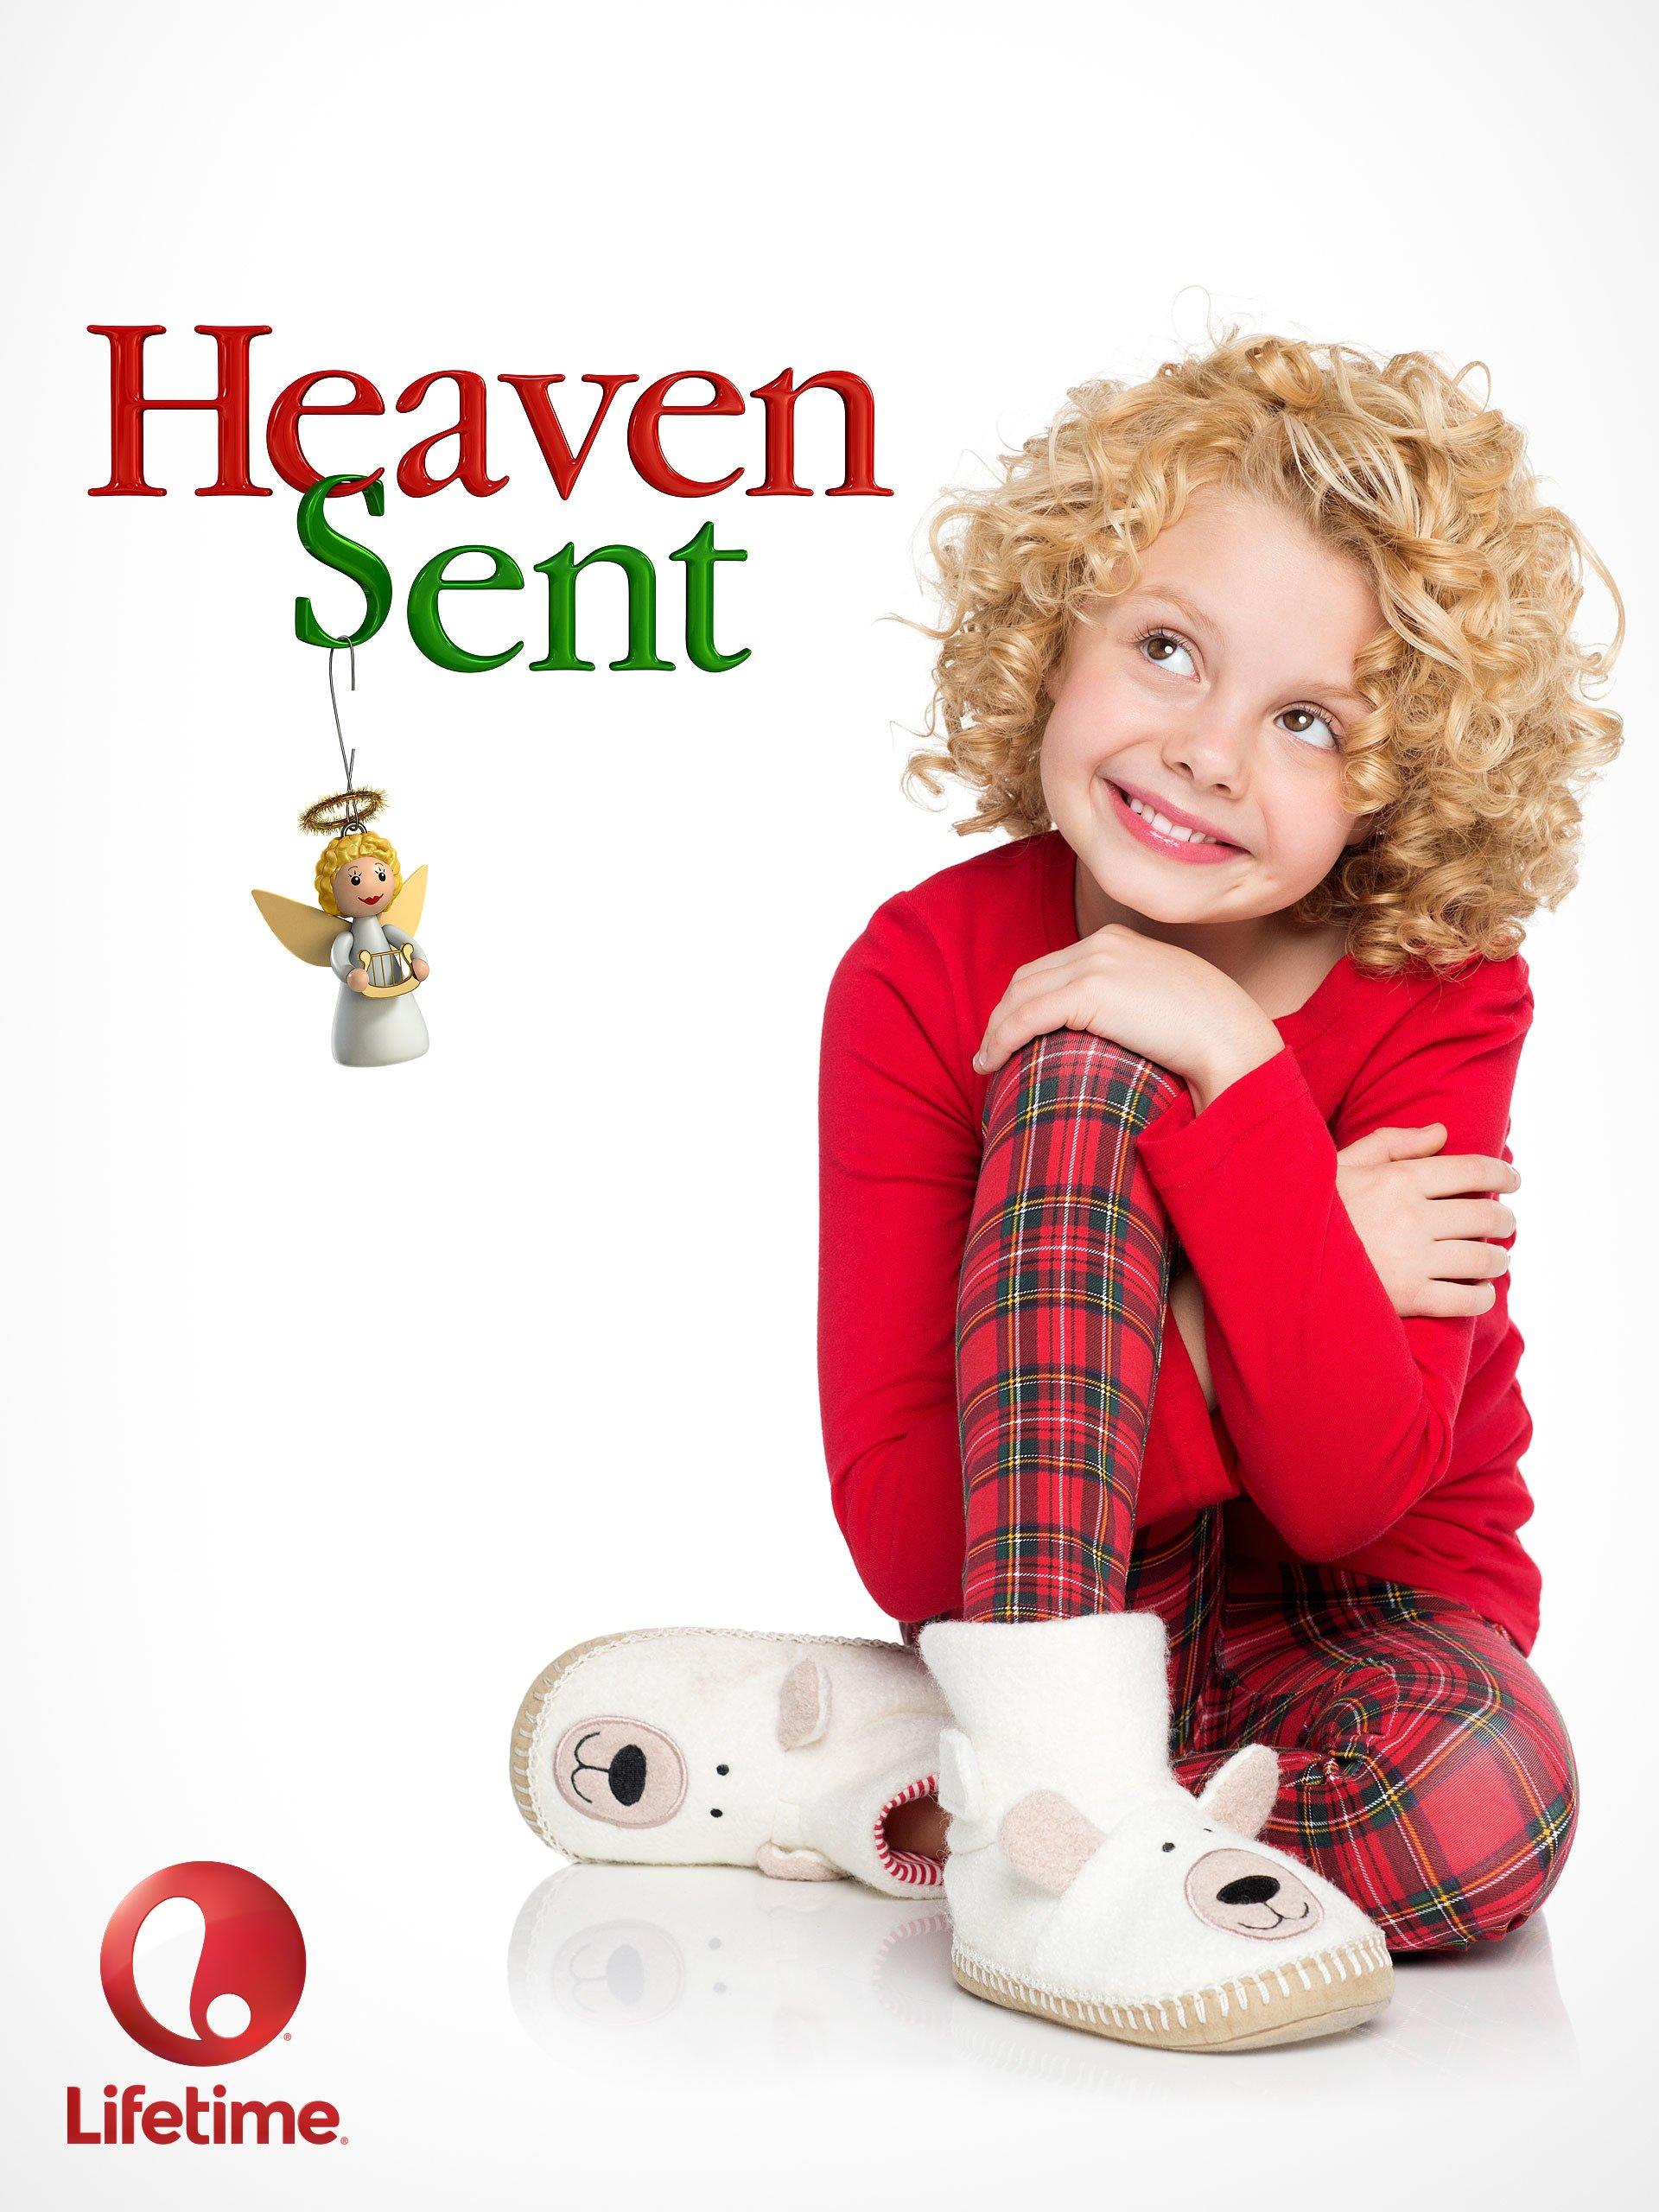 Amazon.com: HEAVEN SENT: LLC Christmastime